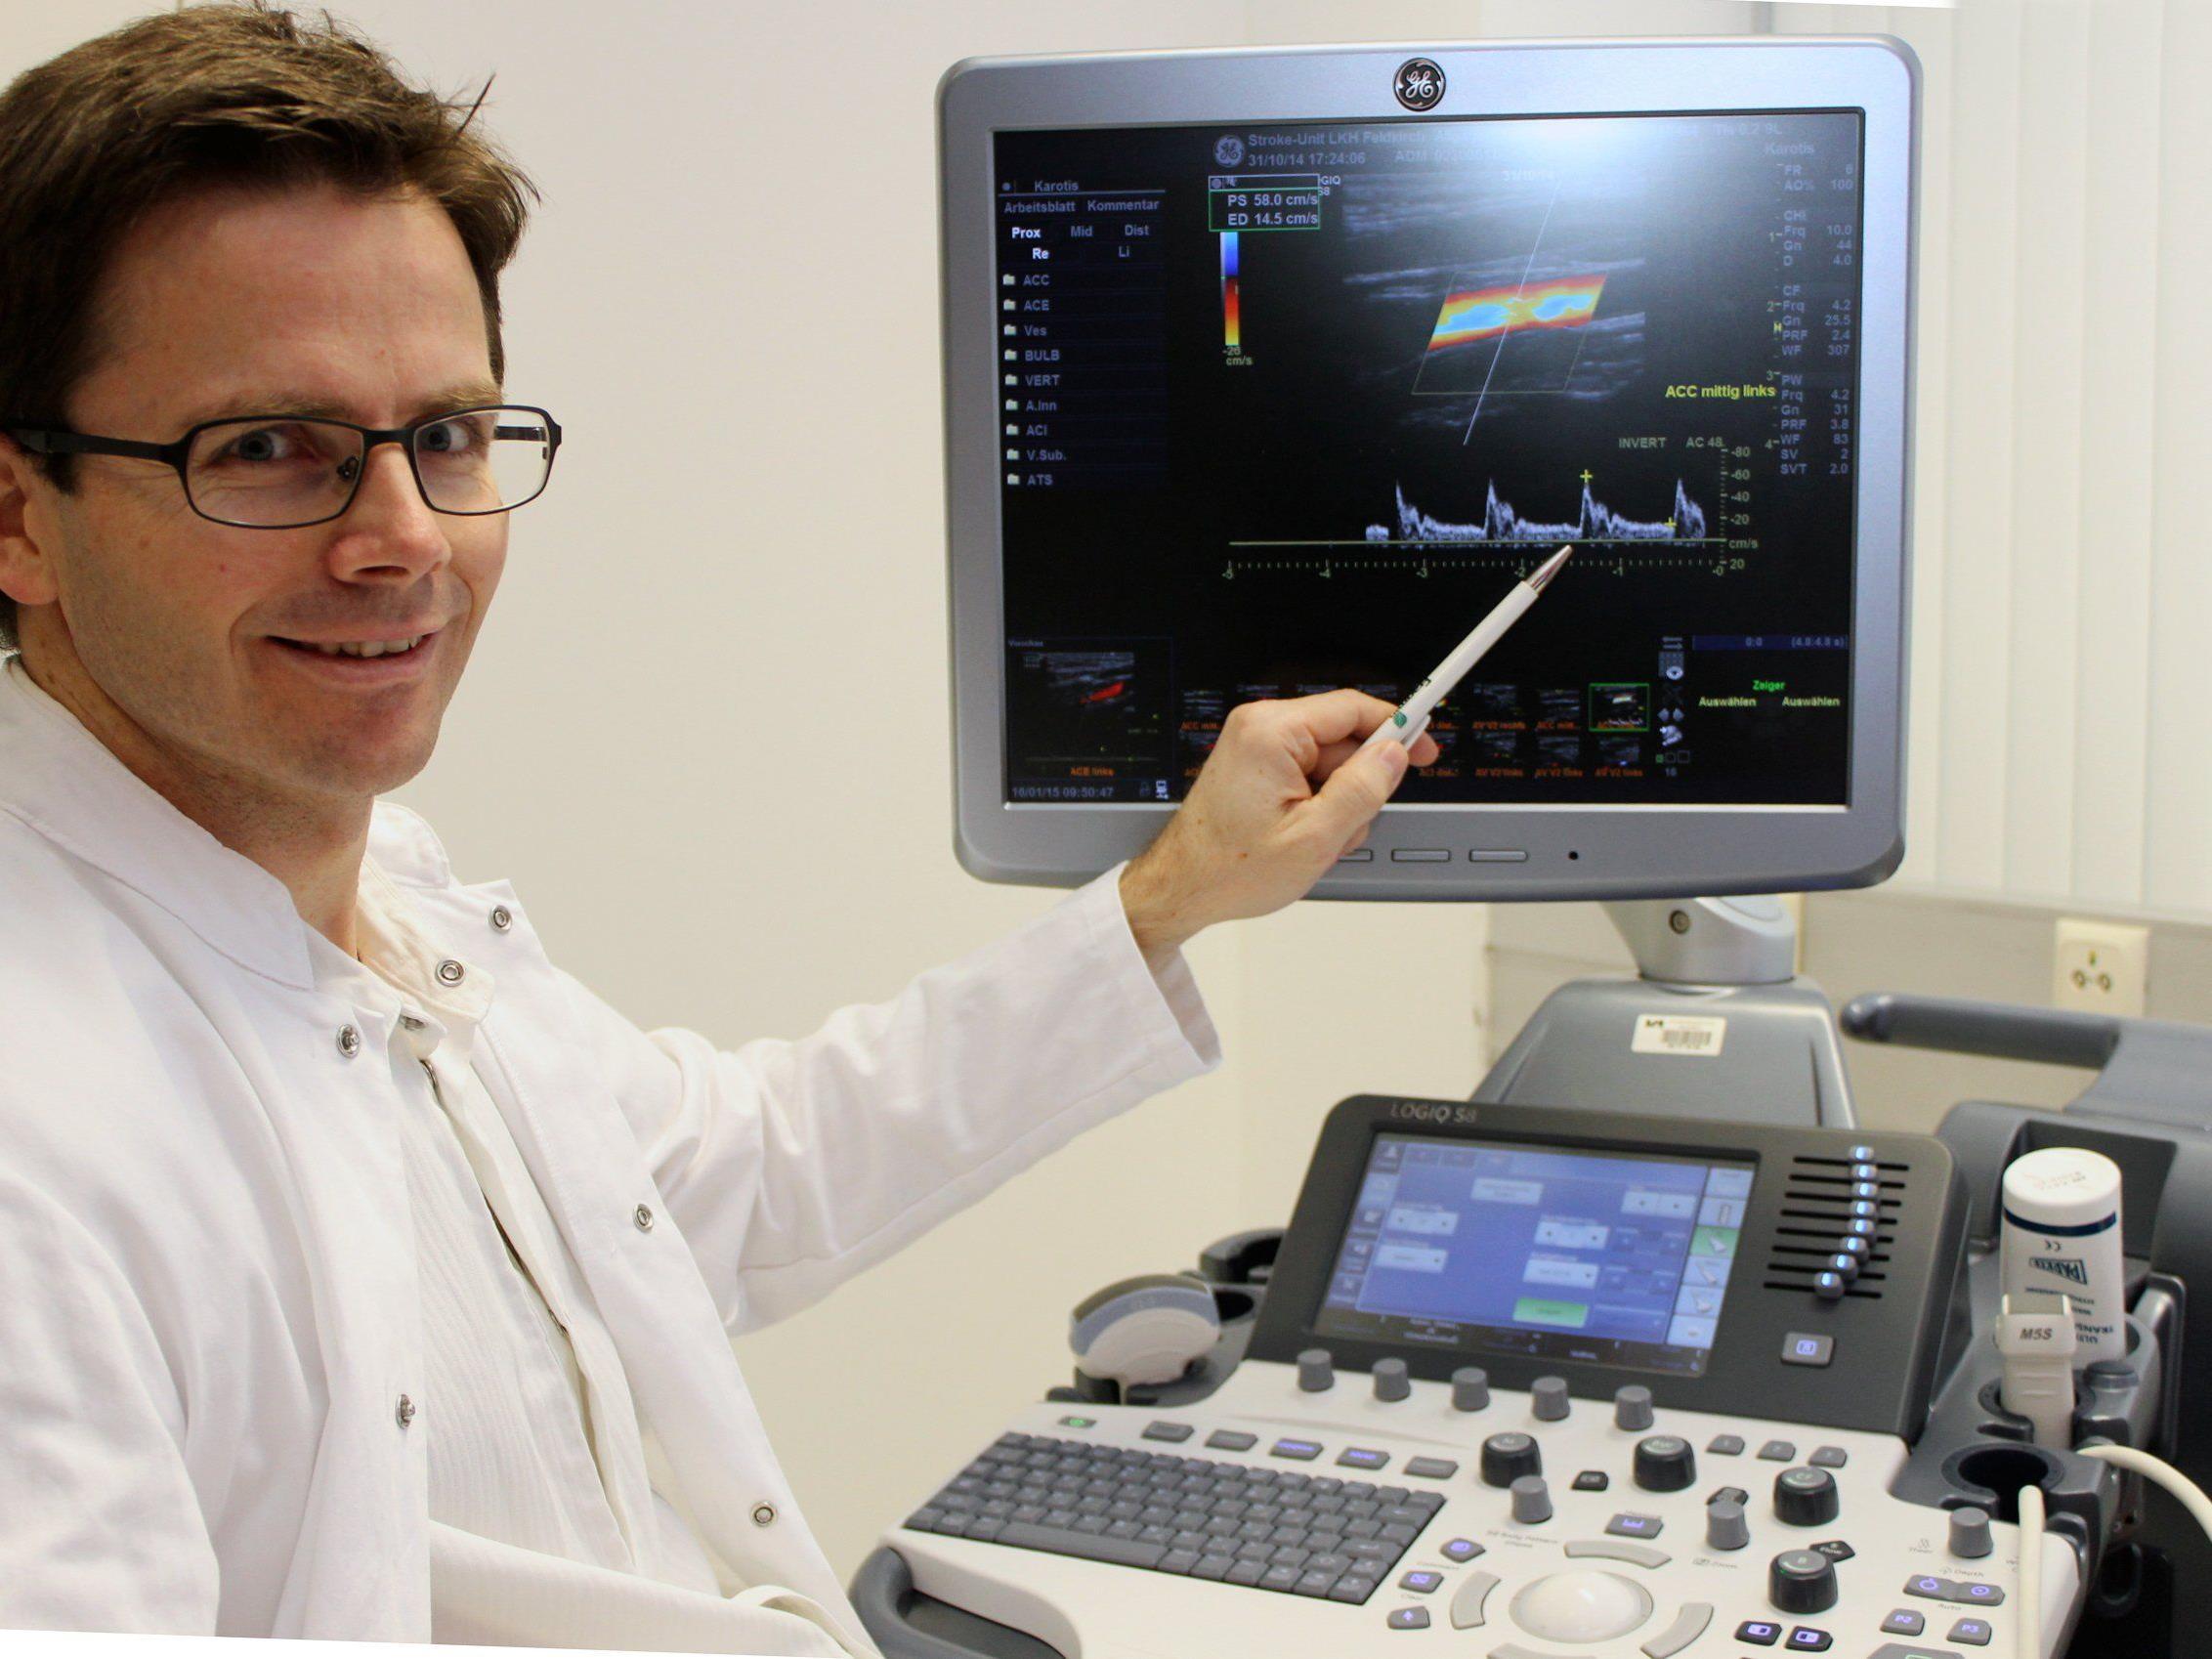 Prim. Dr. Philipp Werner